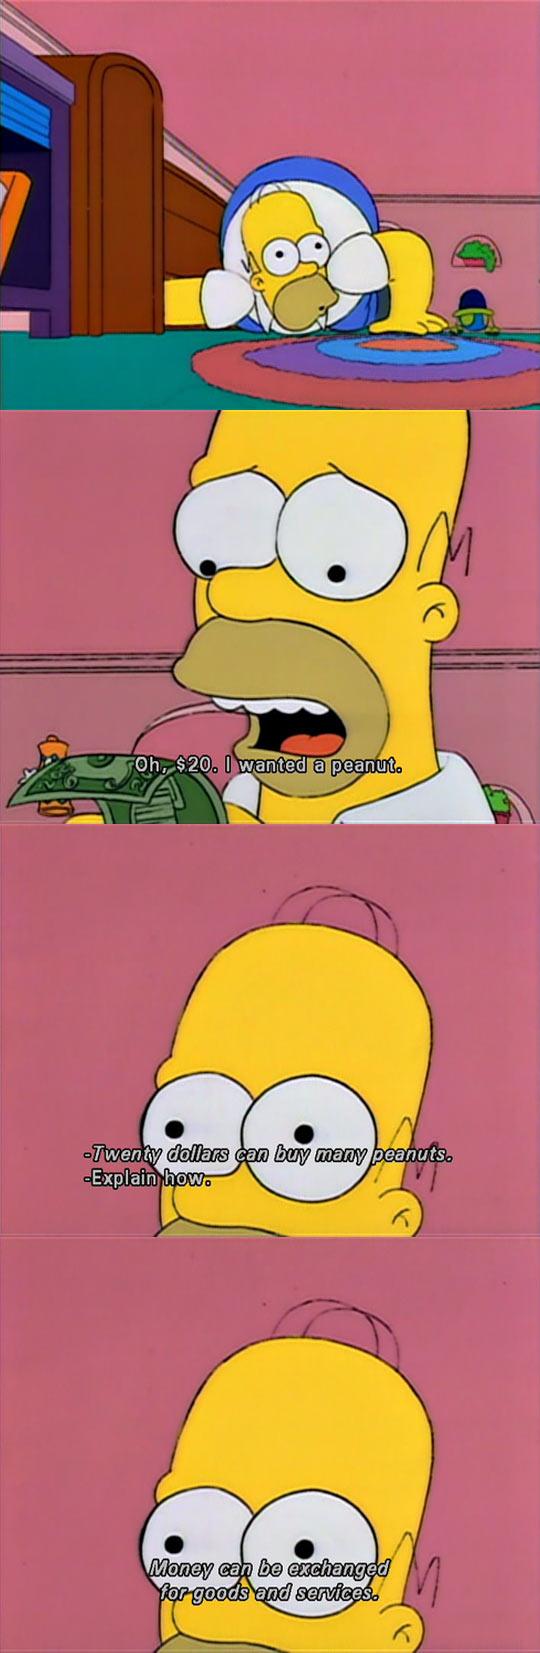 funny-Simpsons-Homer-dollar-peanuts